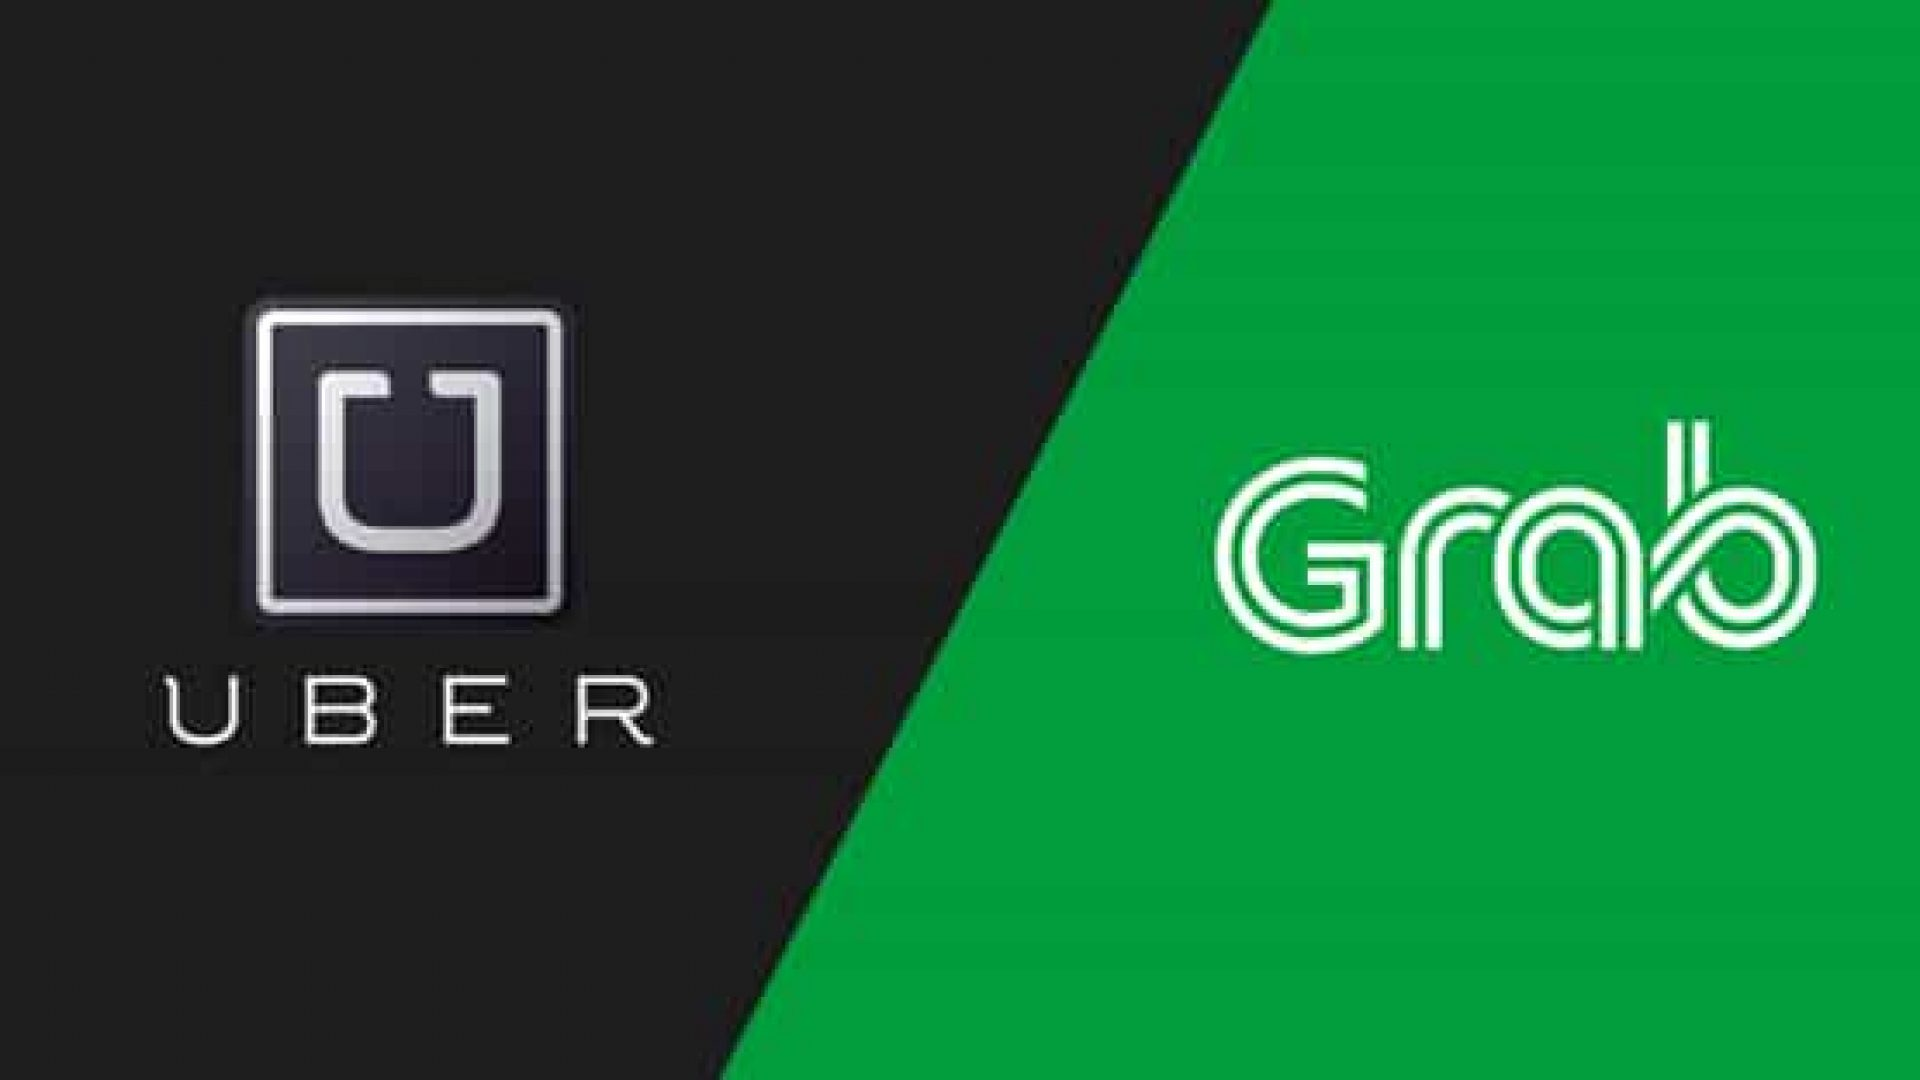 uber-grab_vxwc